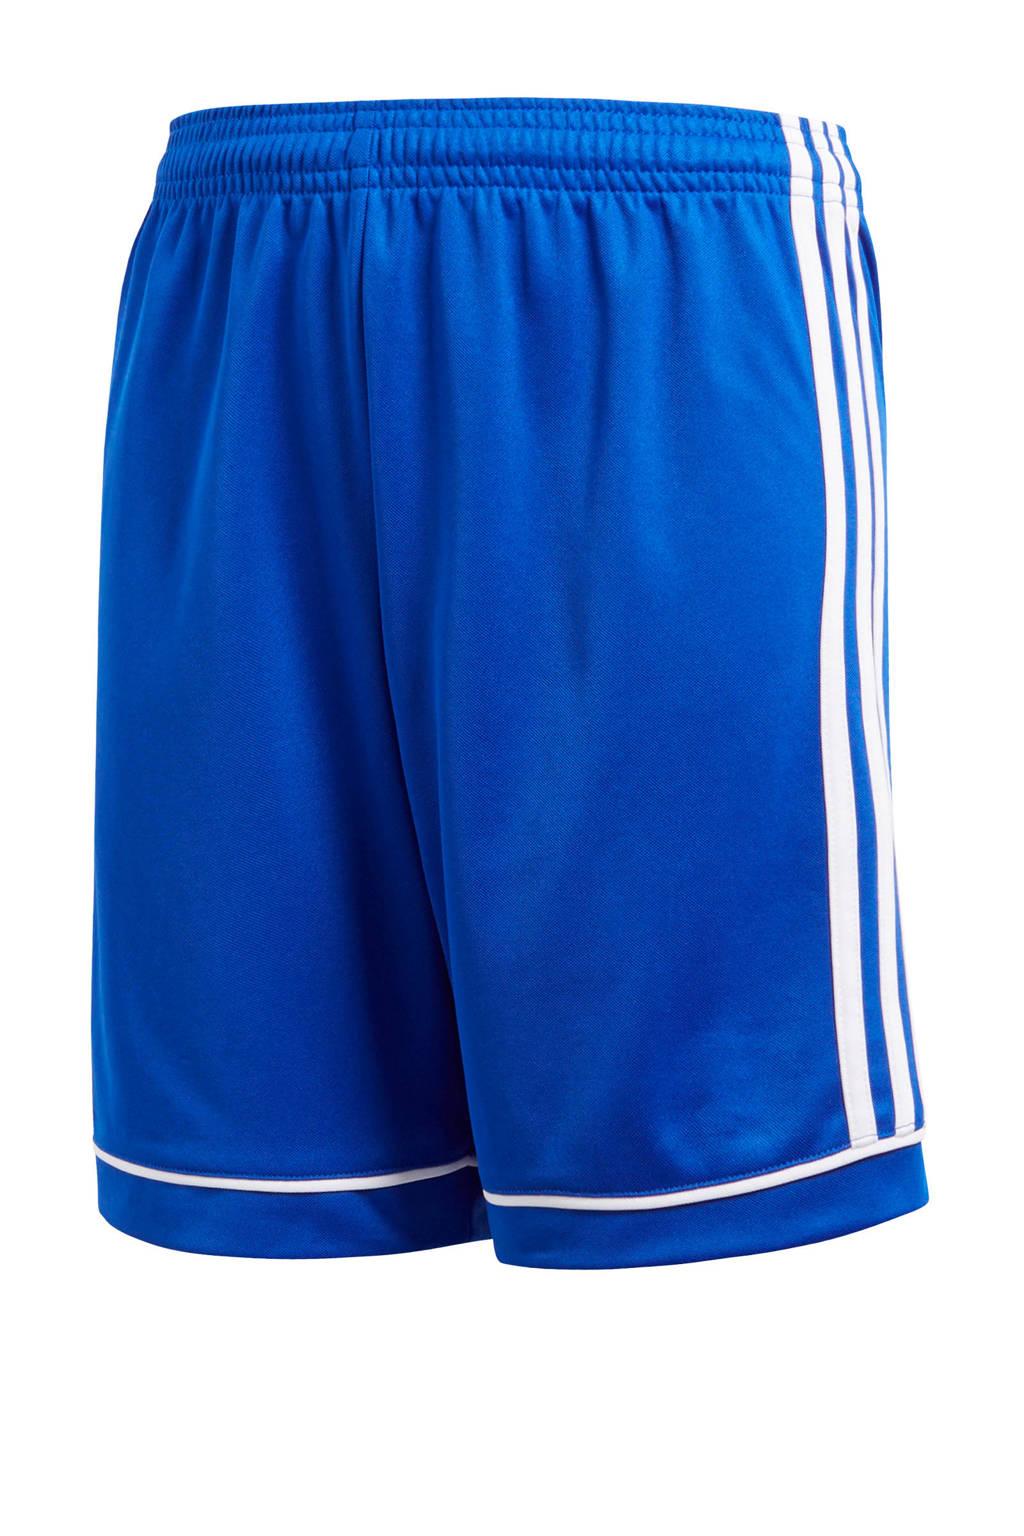 adidas Performance Junior  voetbalshort blauw, Blauw